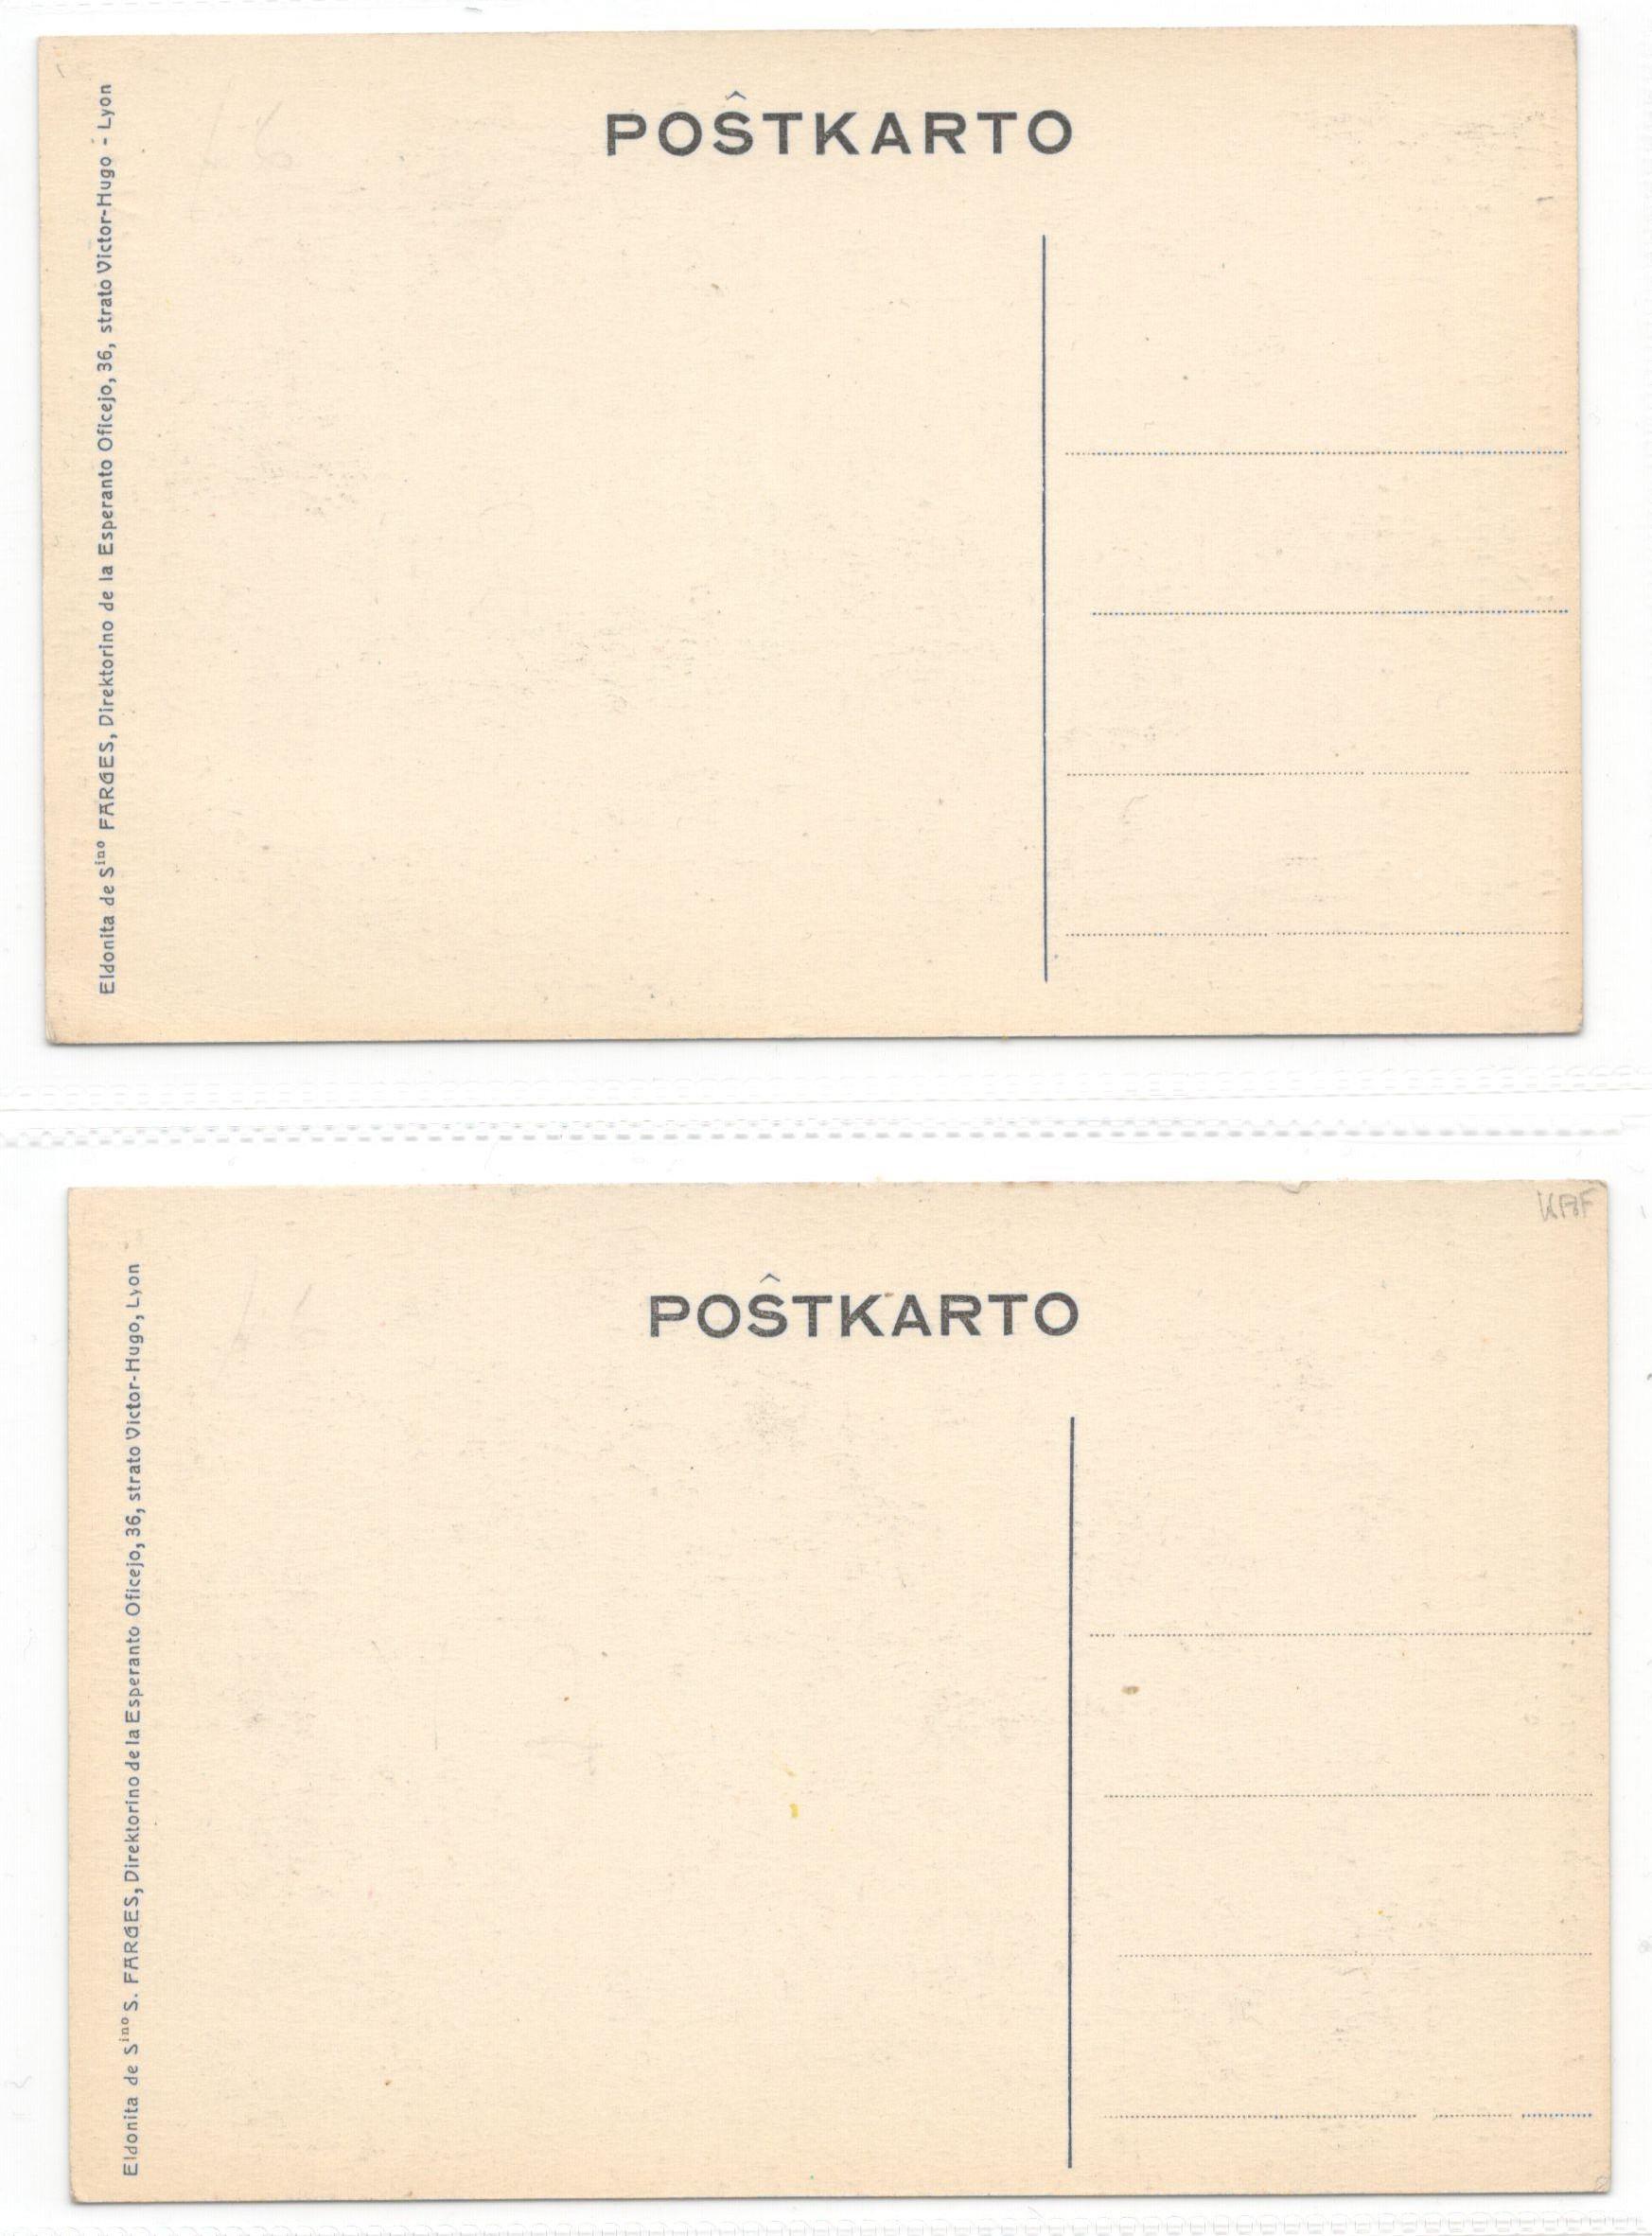 TWO ANTIQUE RUSSIAN ESPERANTO POSTCARDS - Image 2 of 2